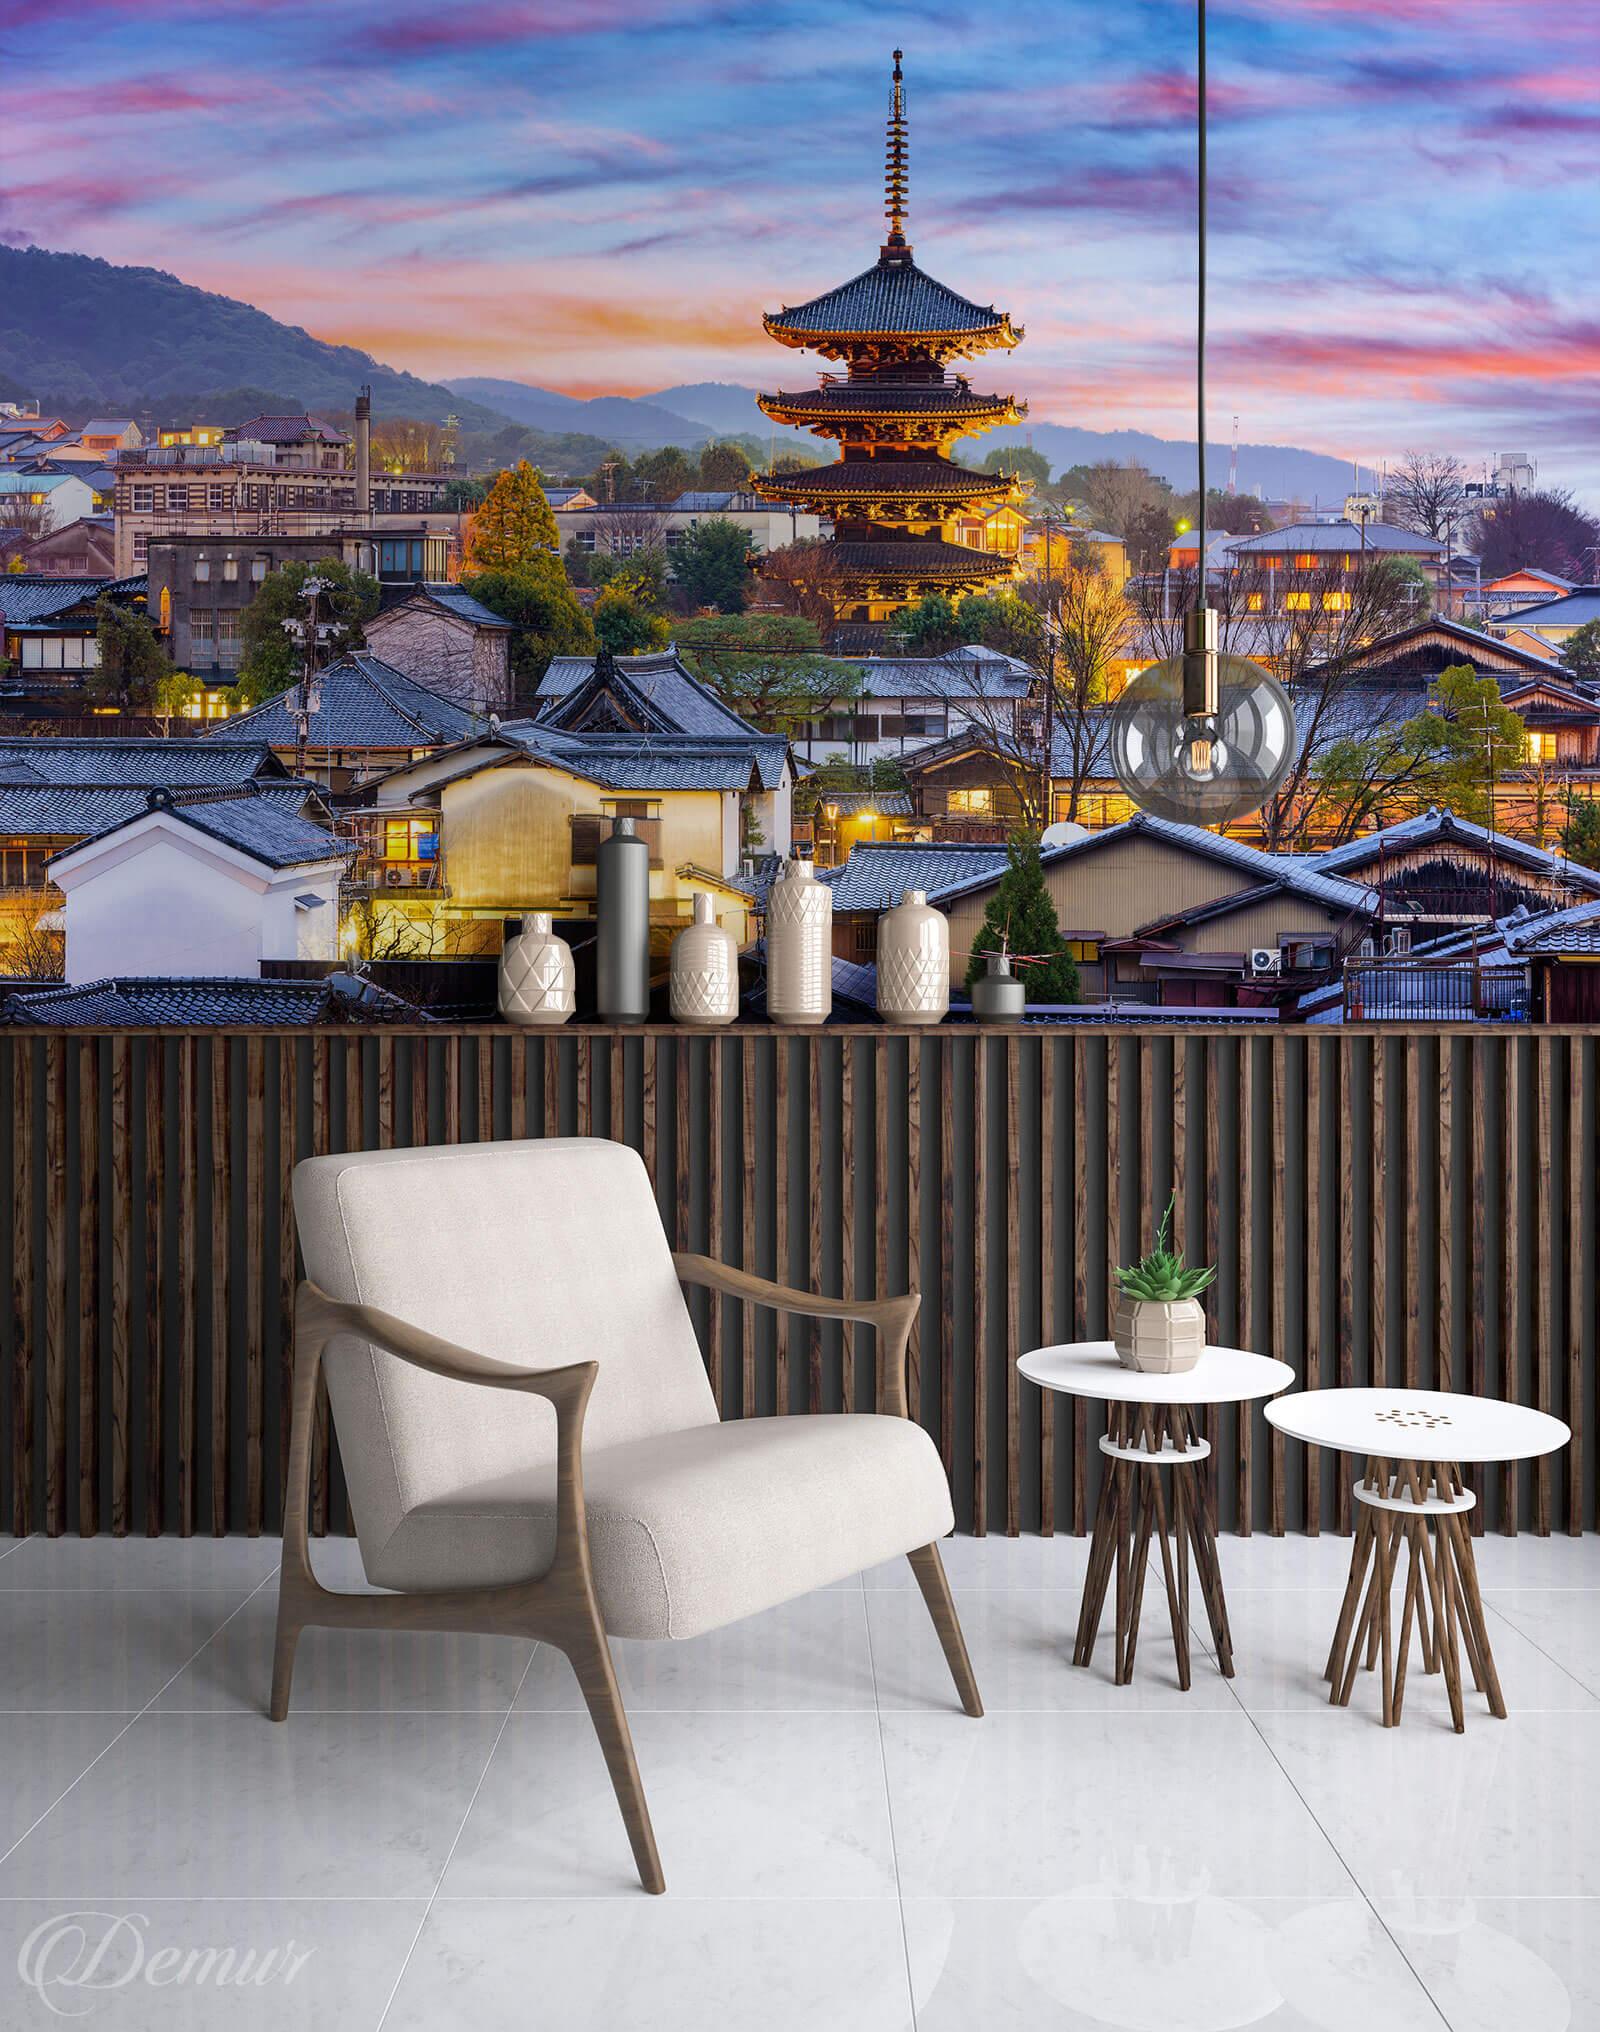 Fototapeta Japońska Architektura - Fototapety Japonia - Demur